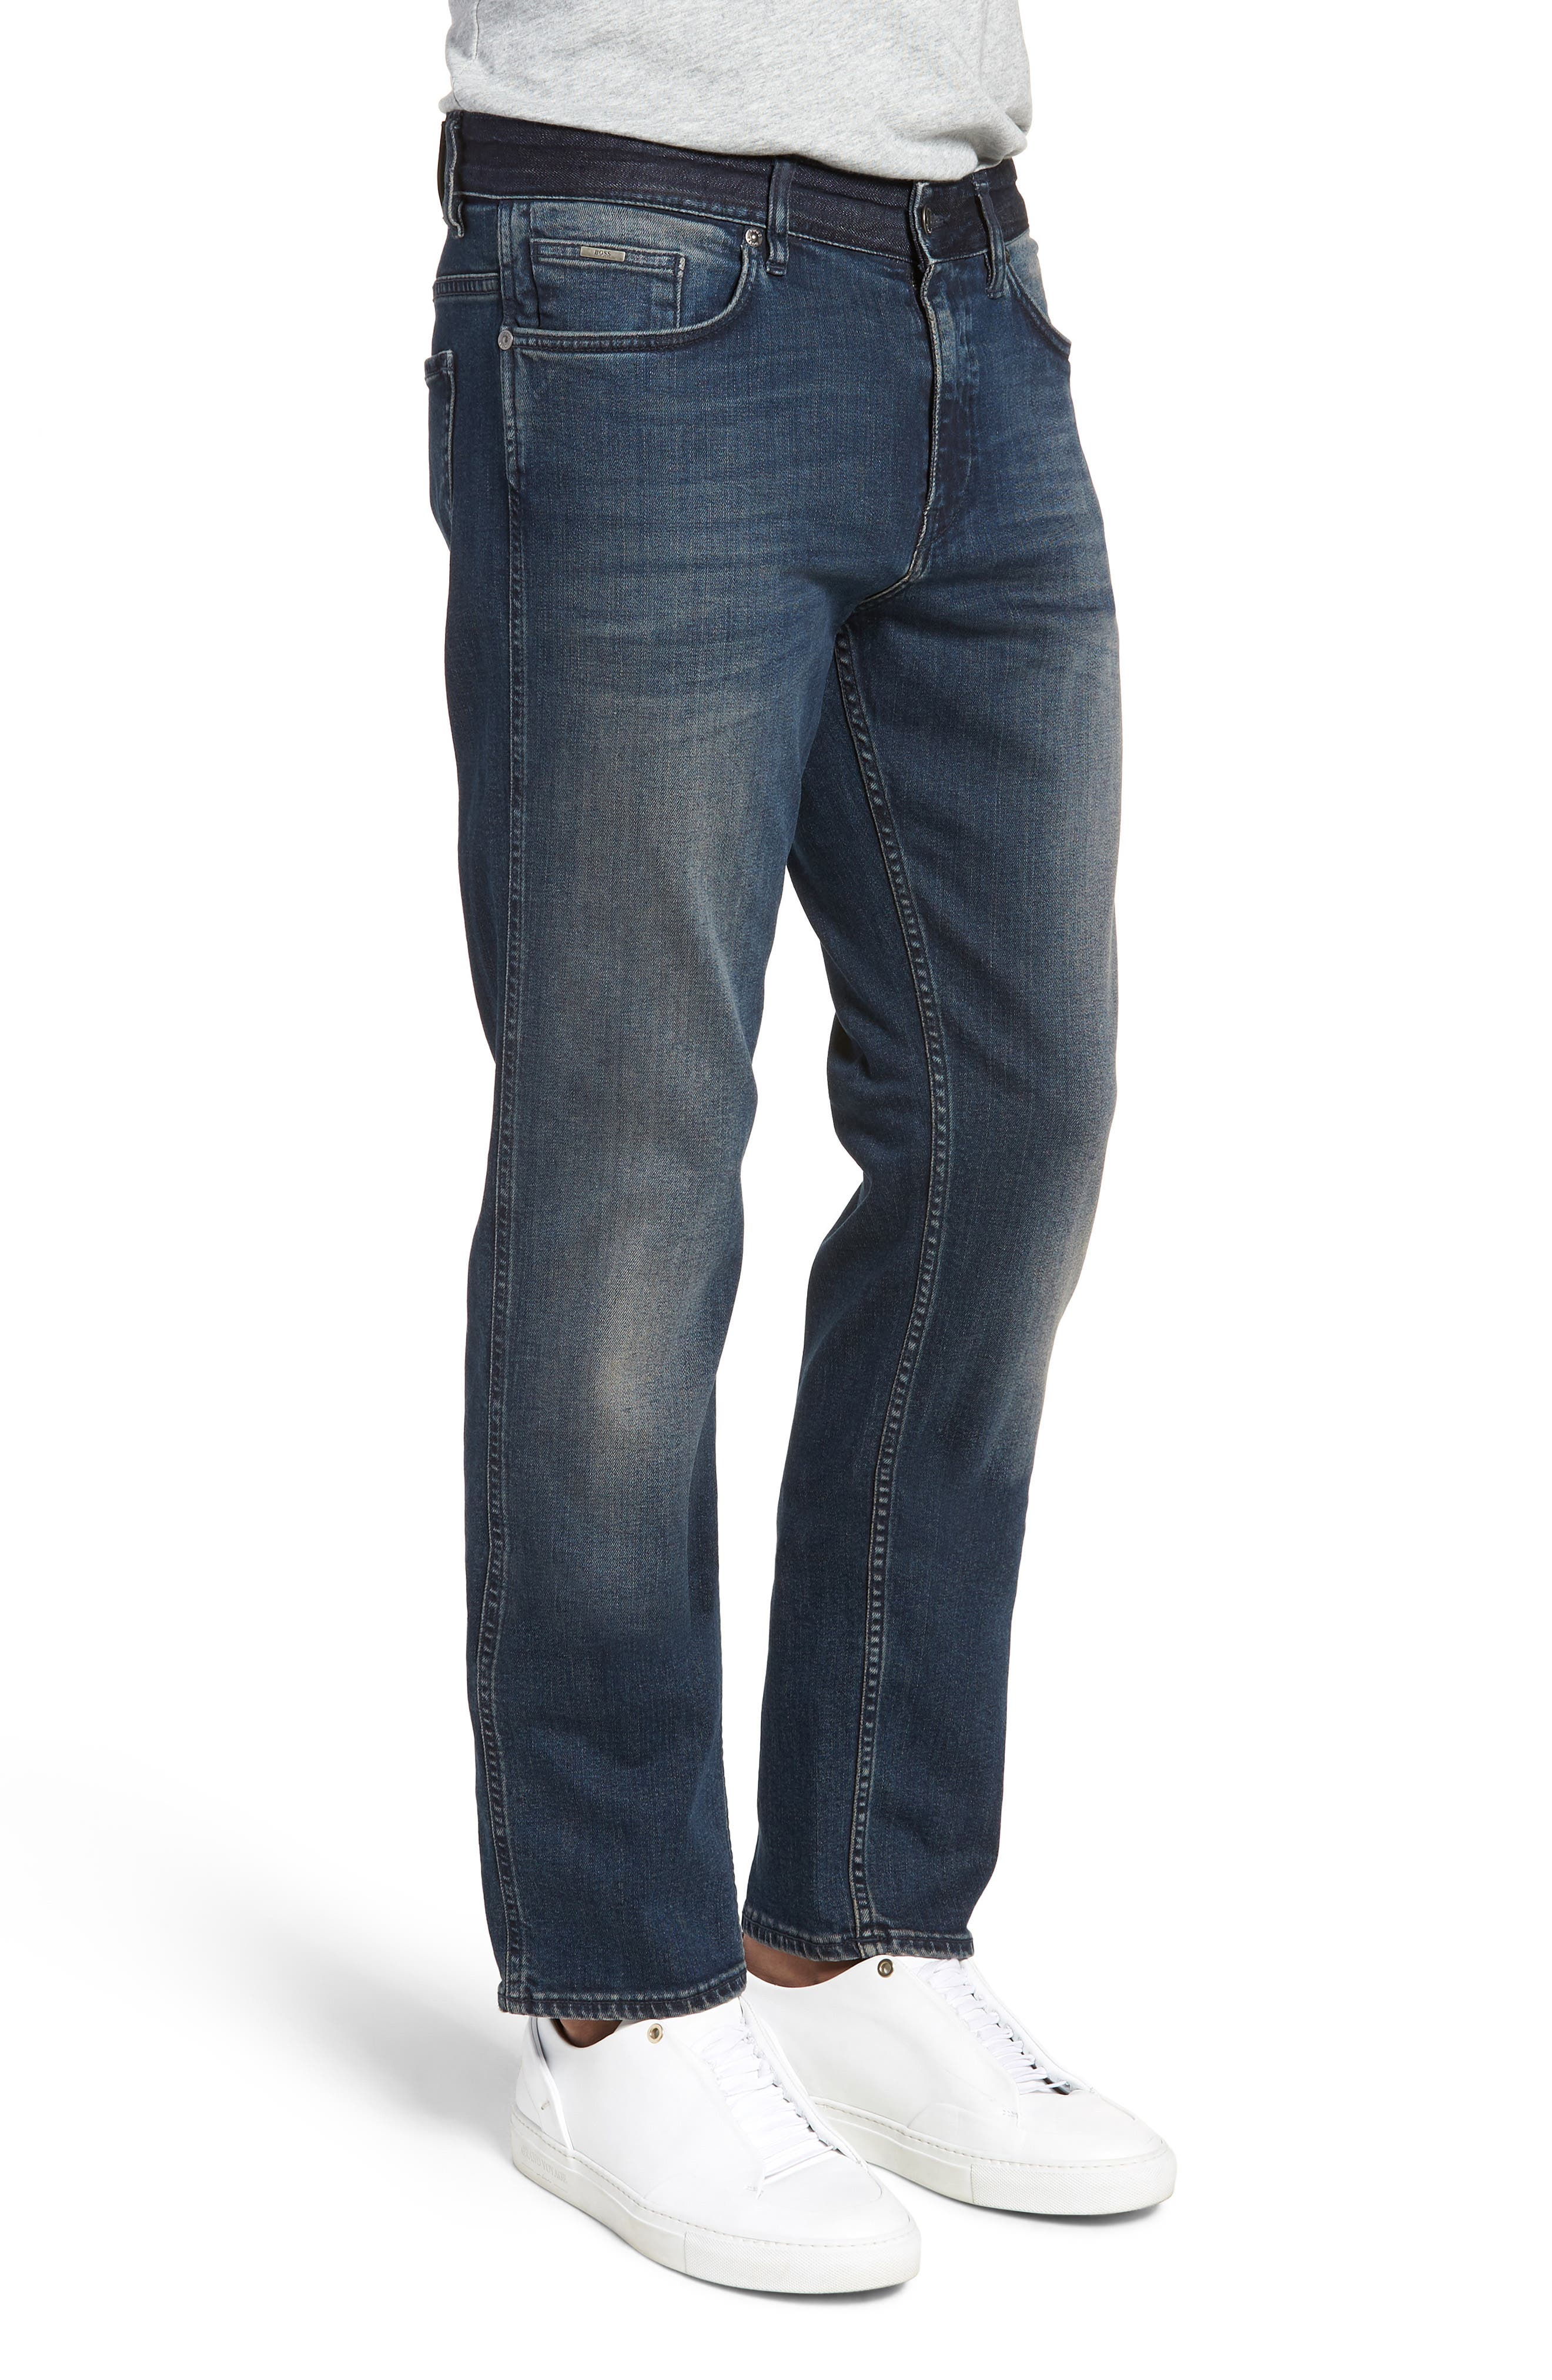 Delaware Slim Fit Jeans,                             Alternate thumbnail 3, color,                             Blue